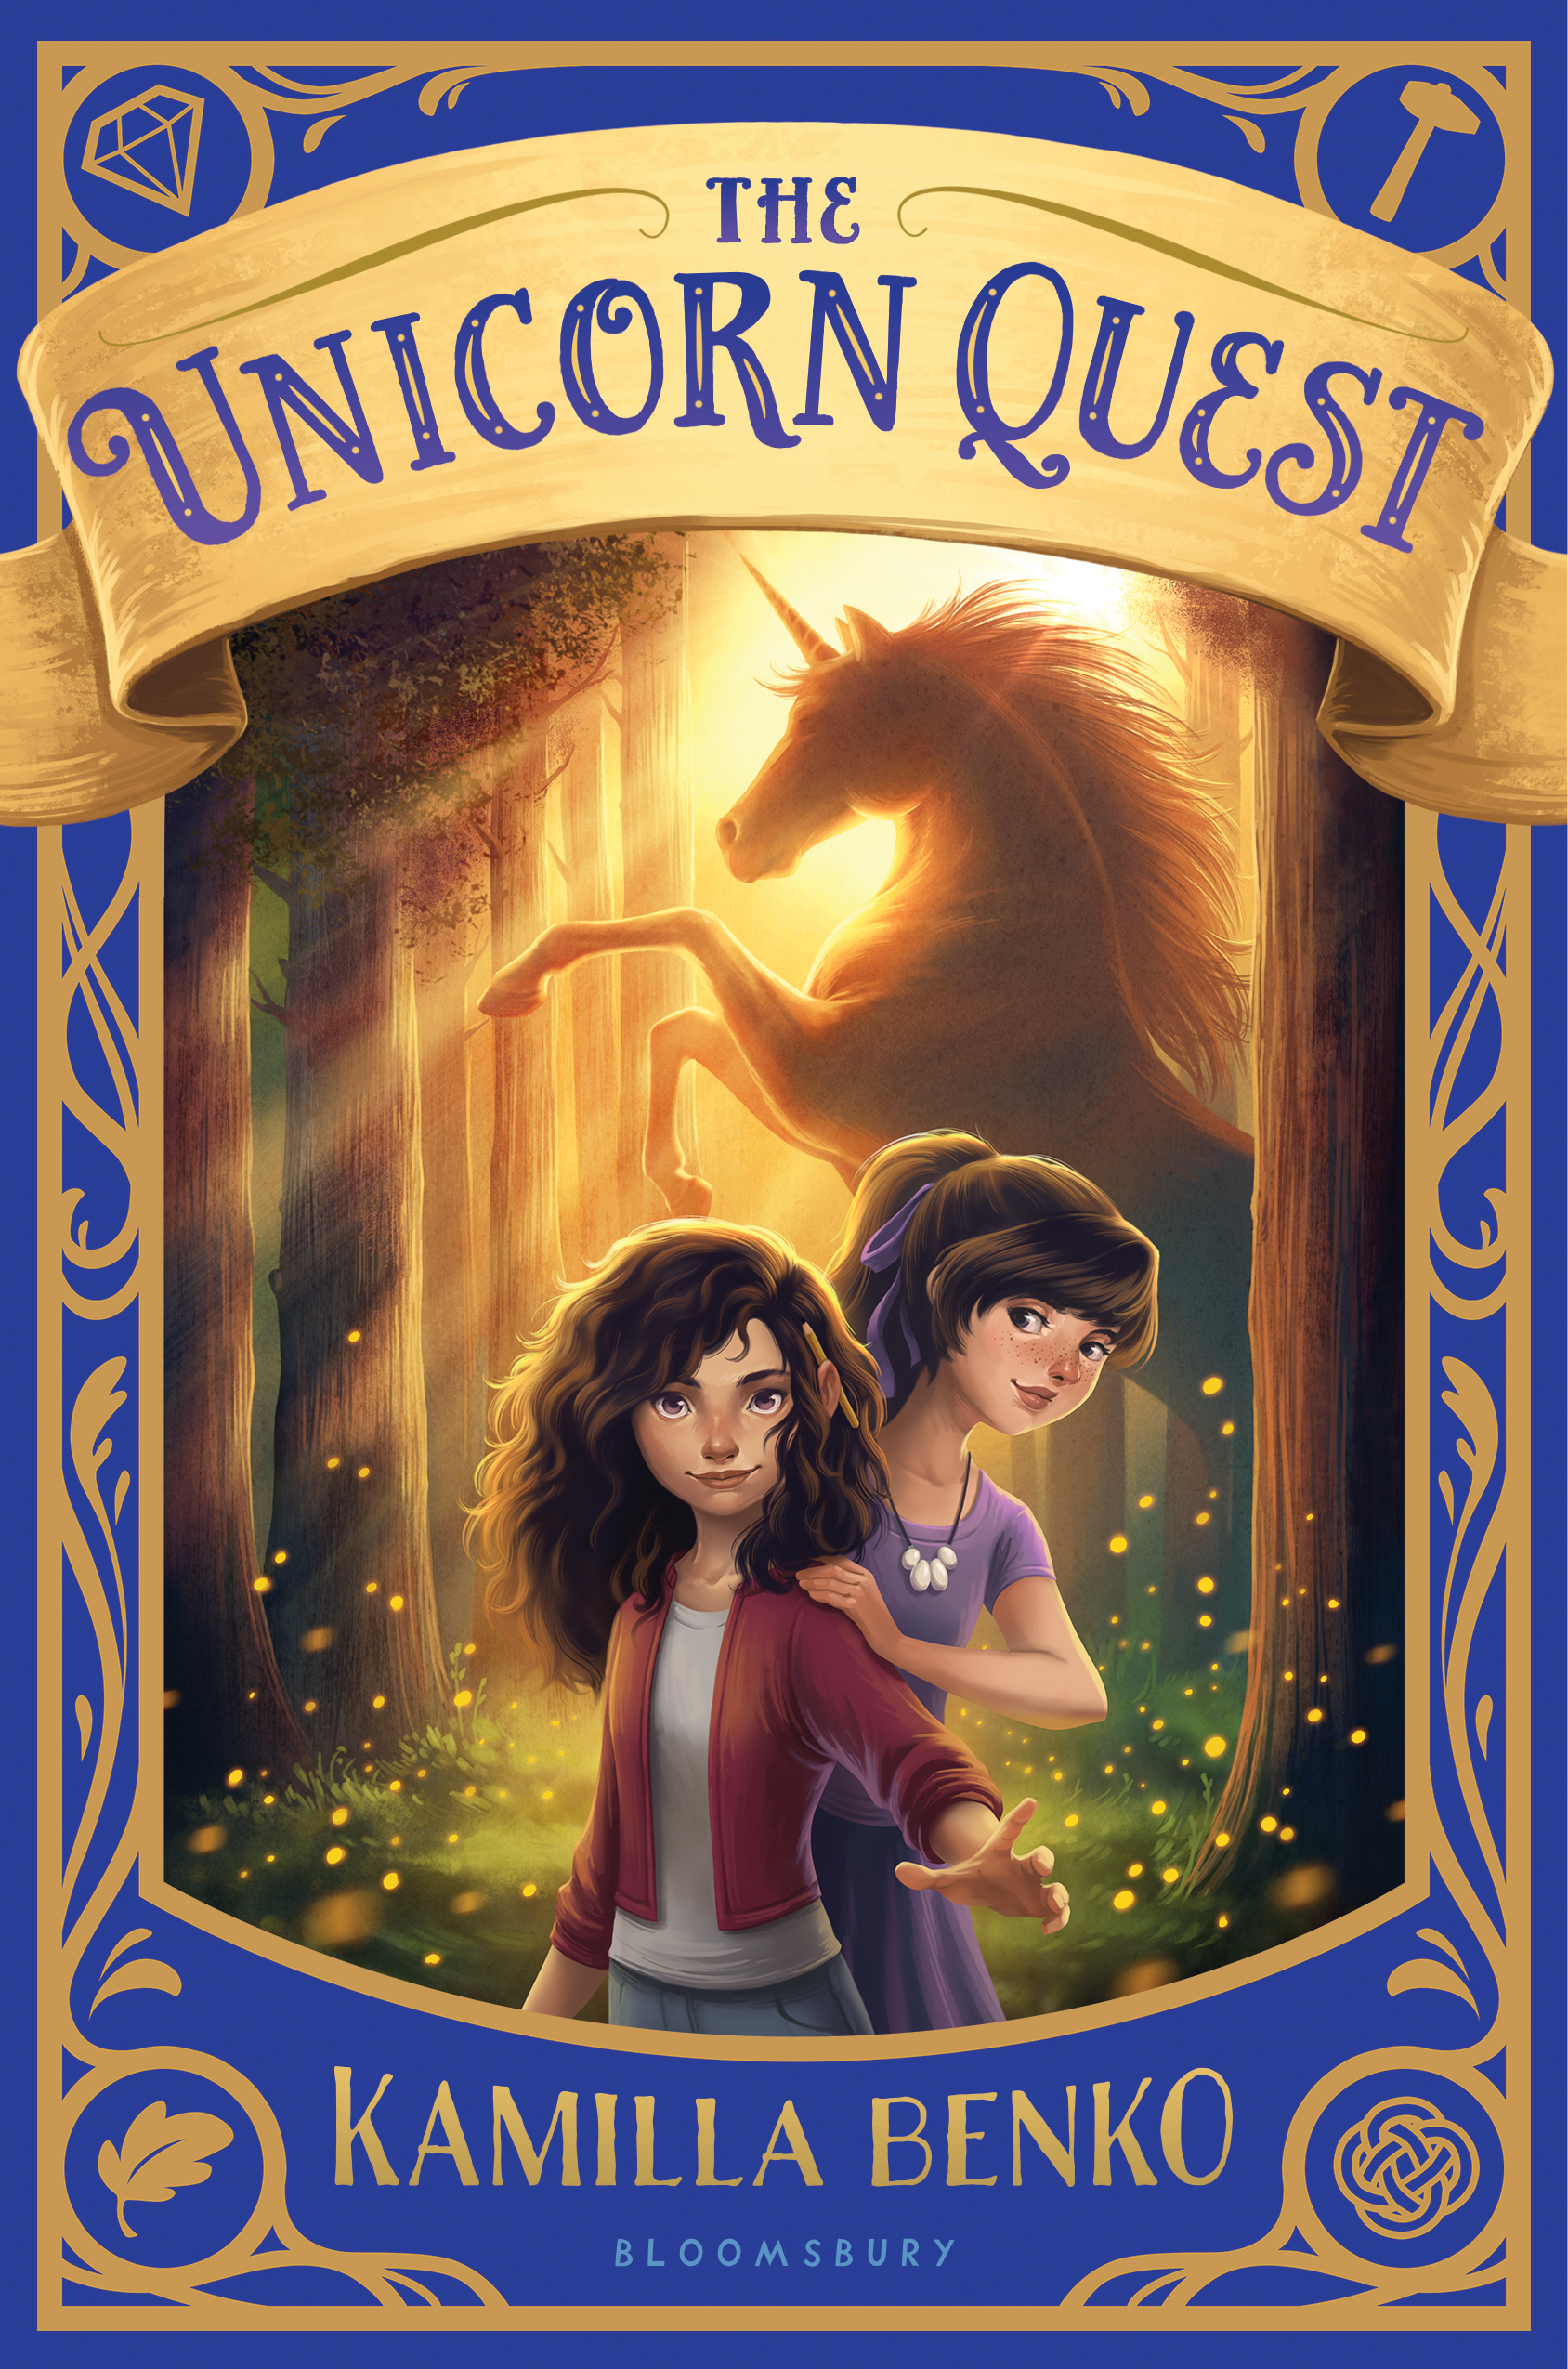 Unicorn Quest_final_v3_cataNEW_FINAL.jpg